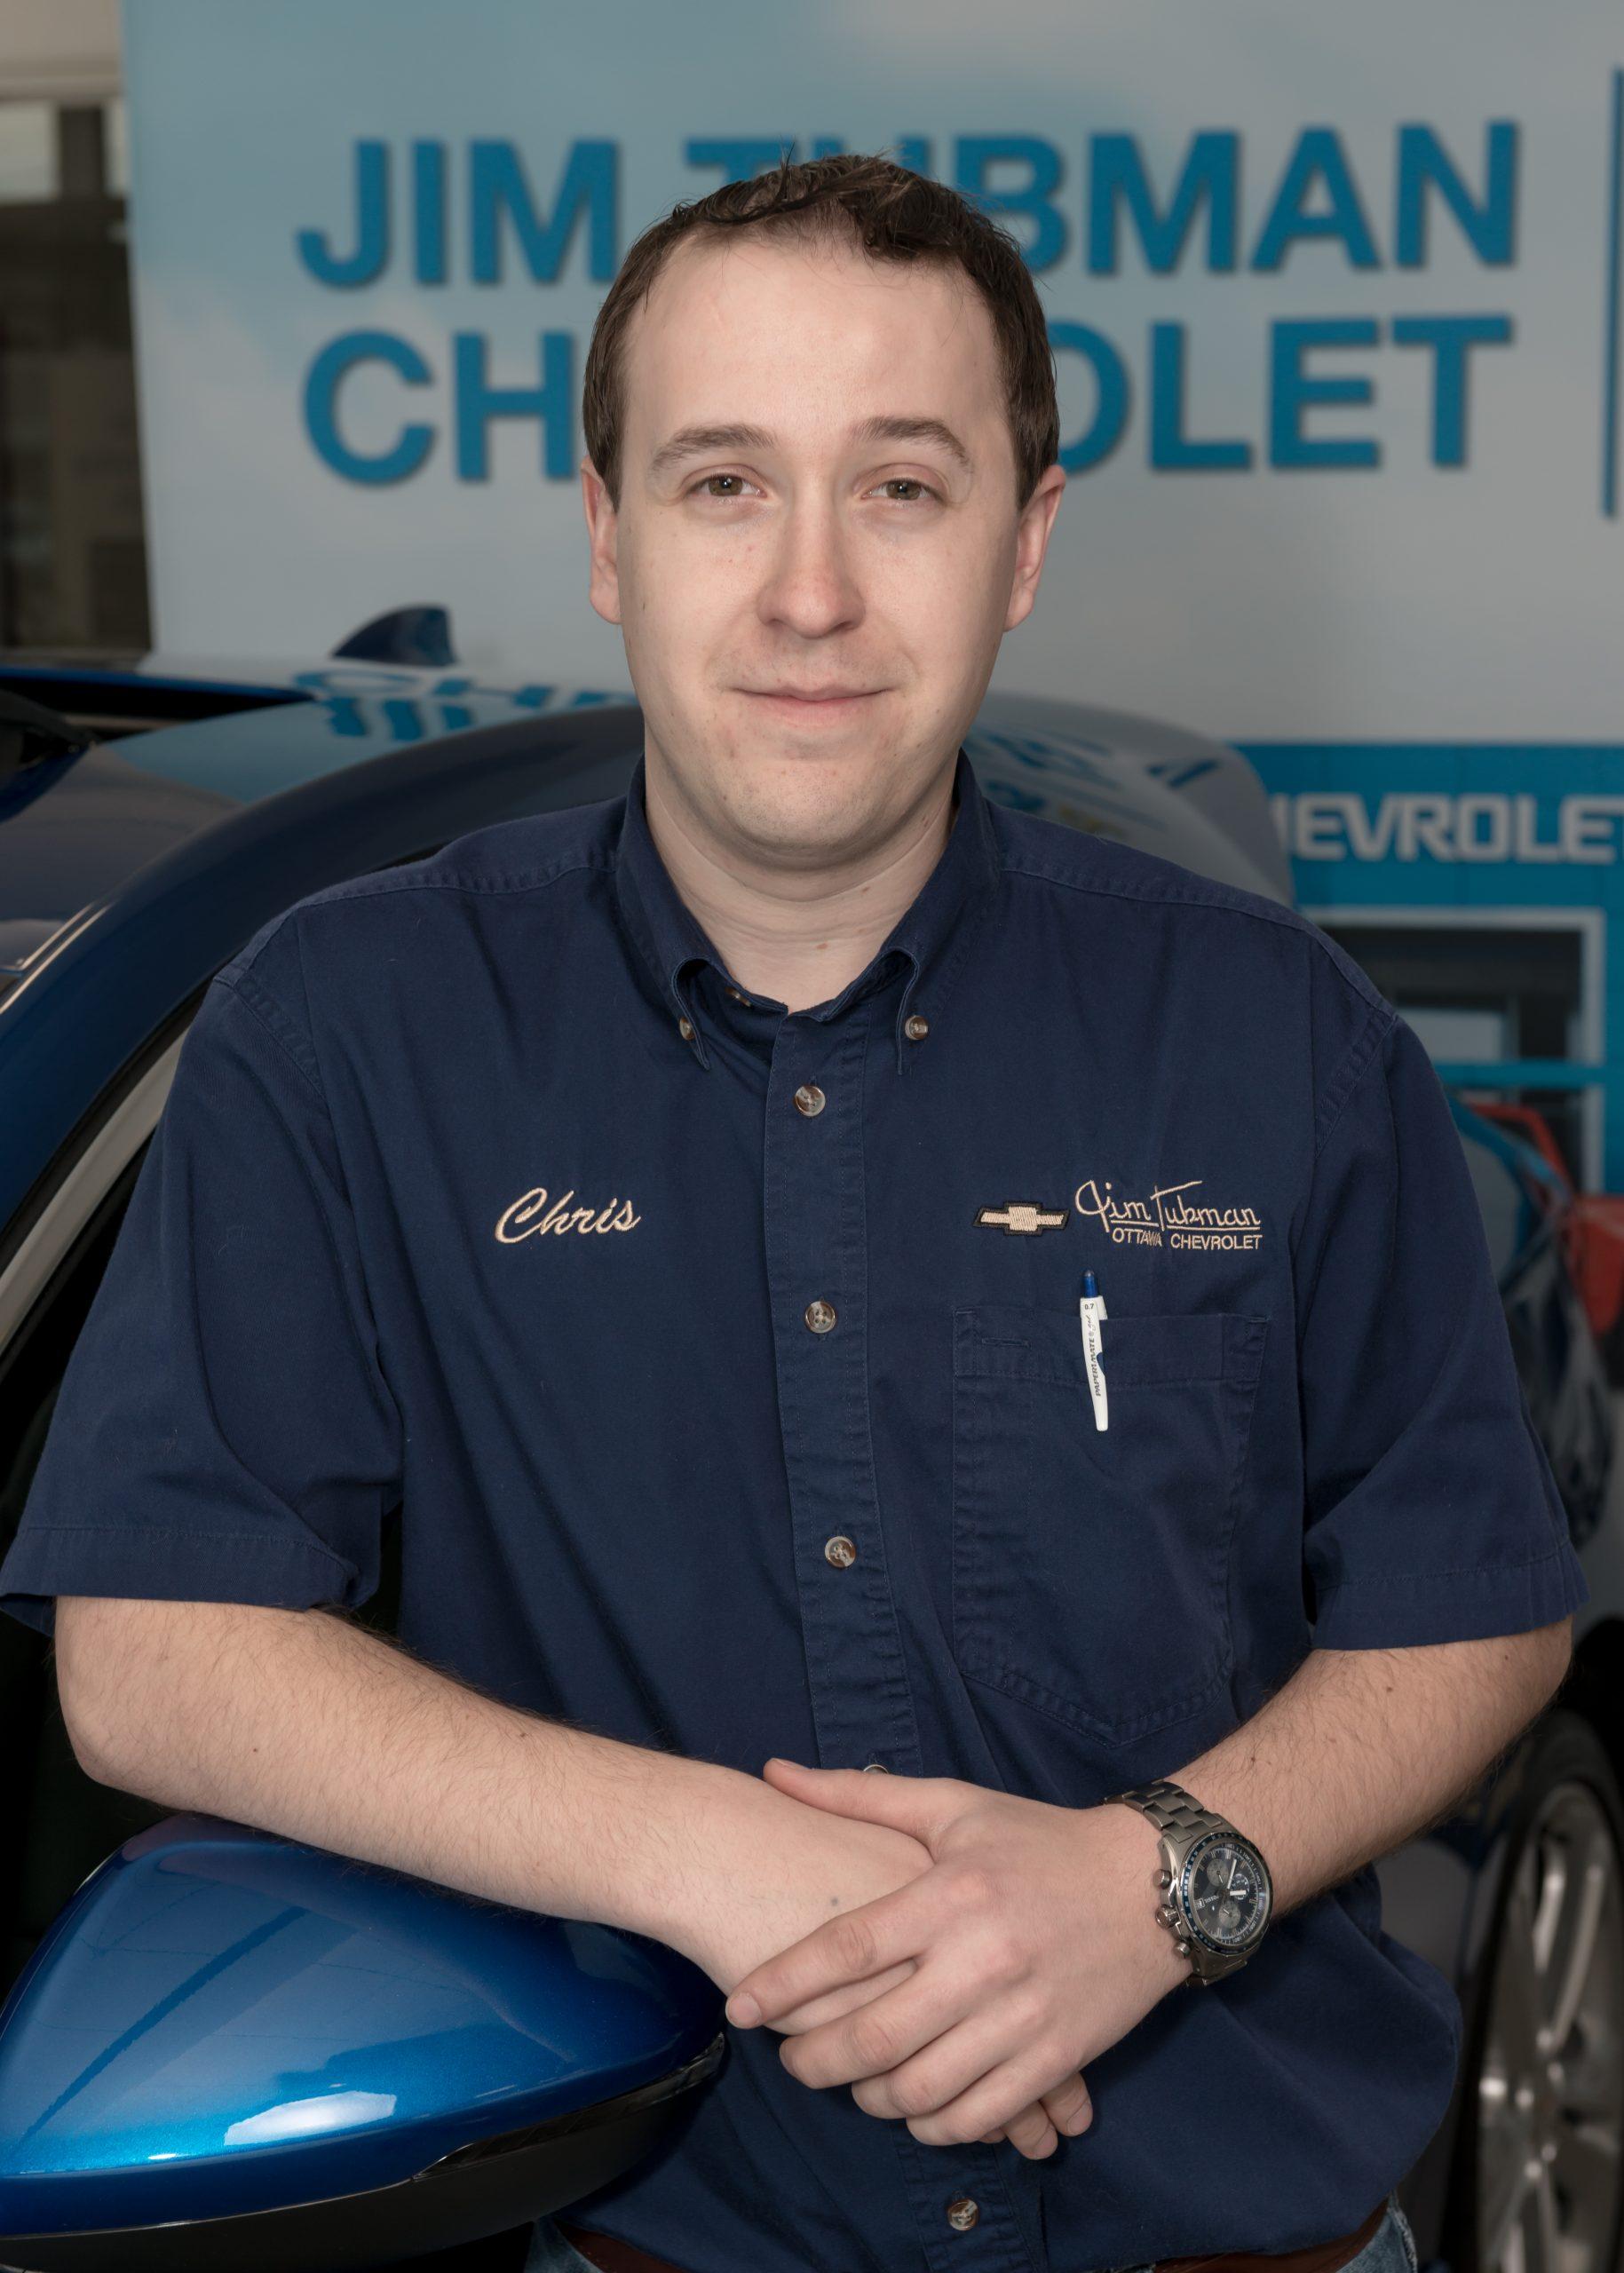 Chris Ellard